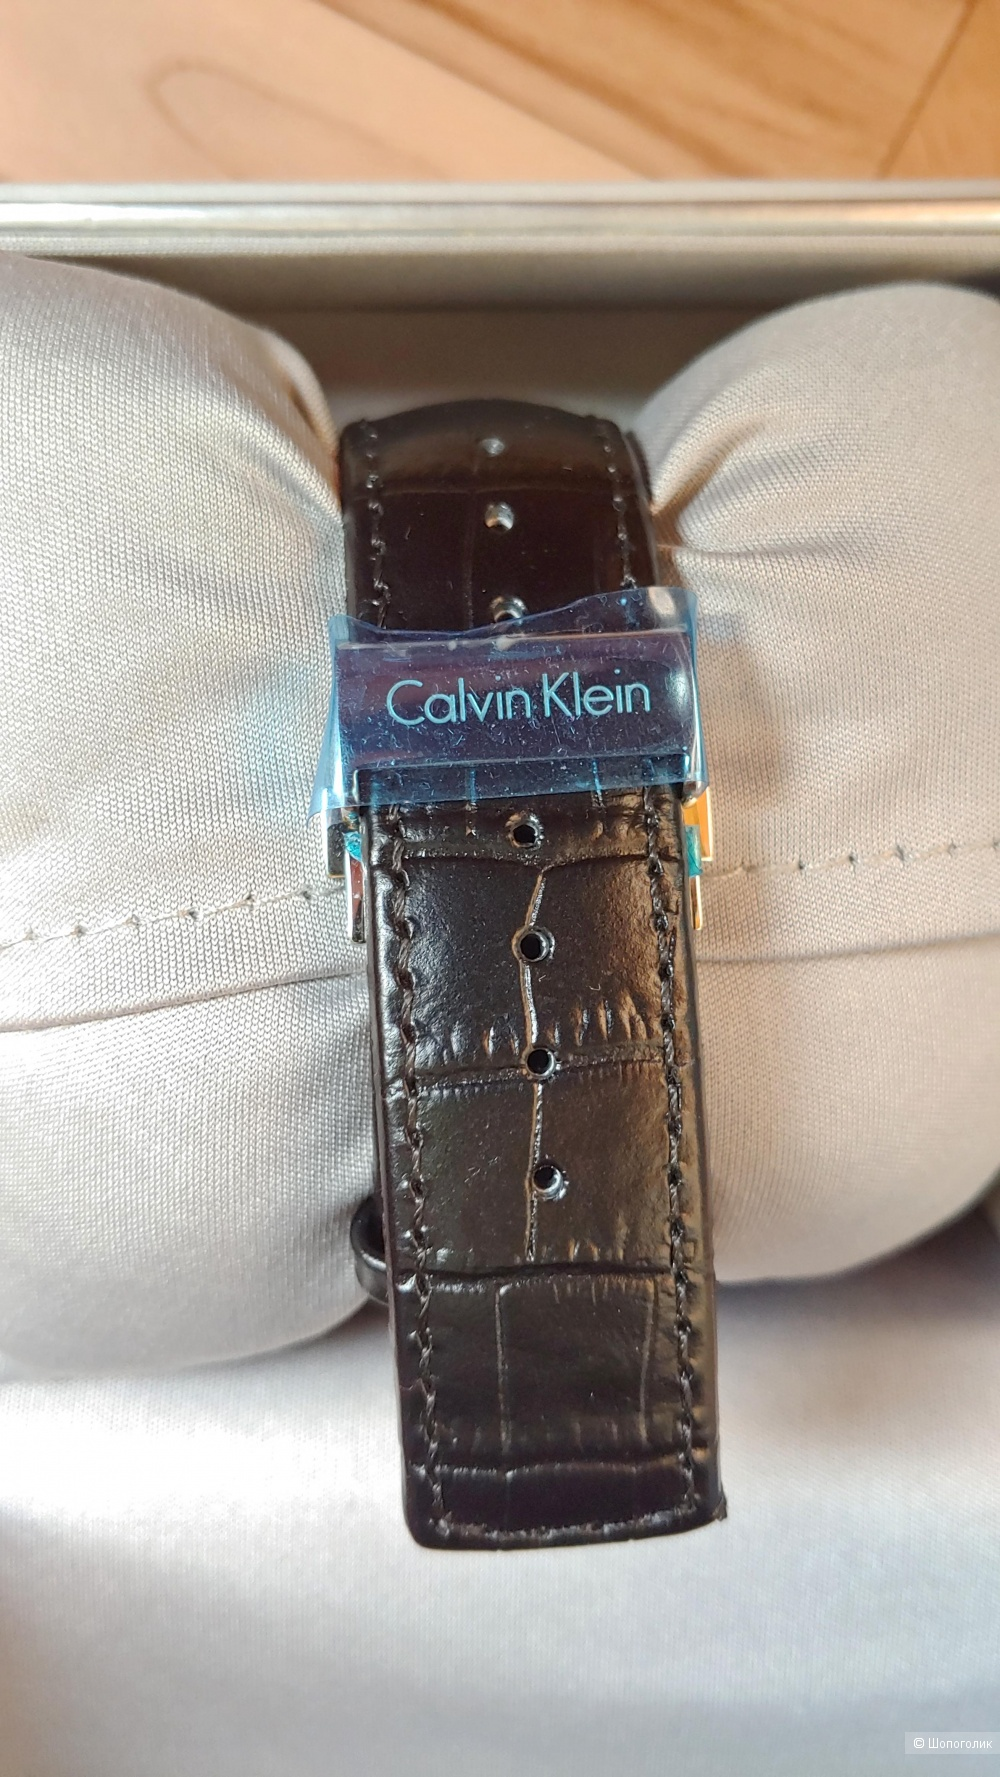 Calvin klein Infinite Automatic